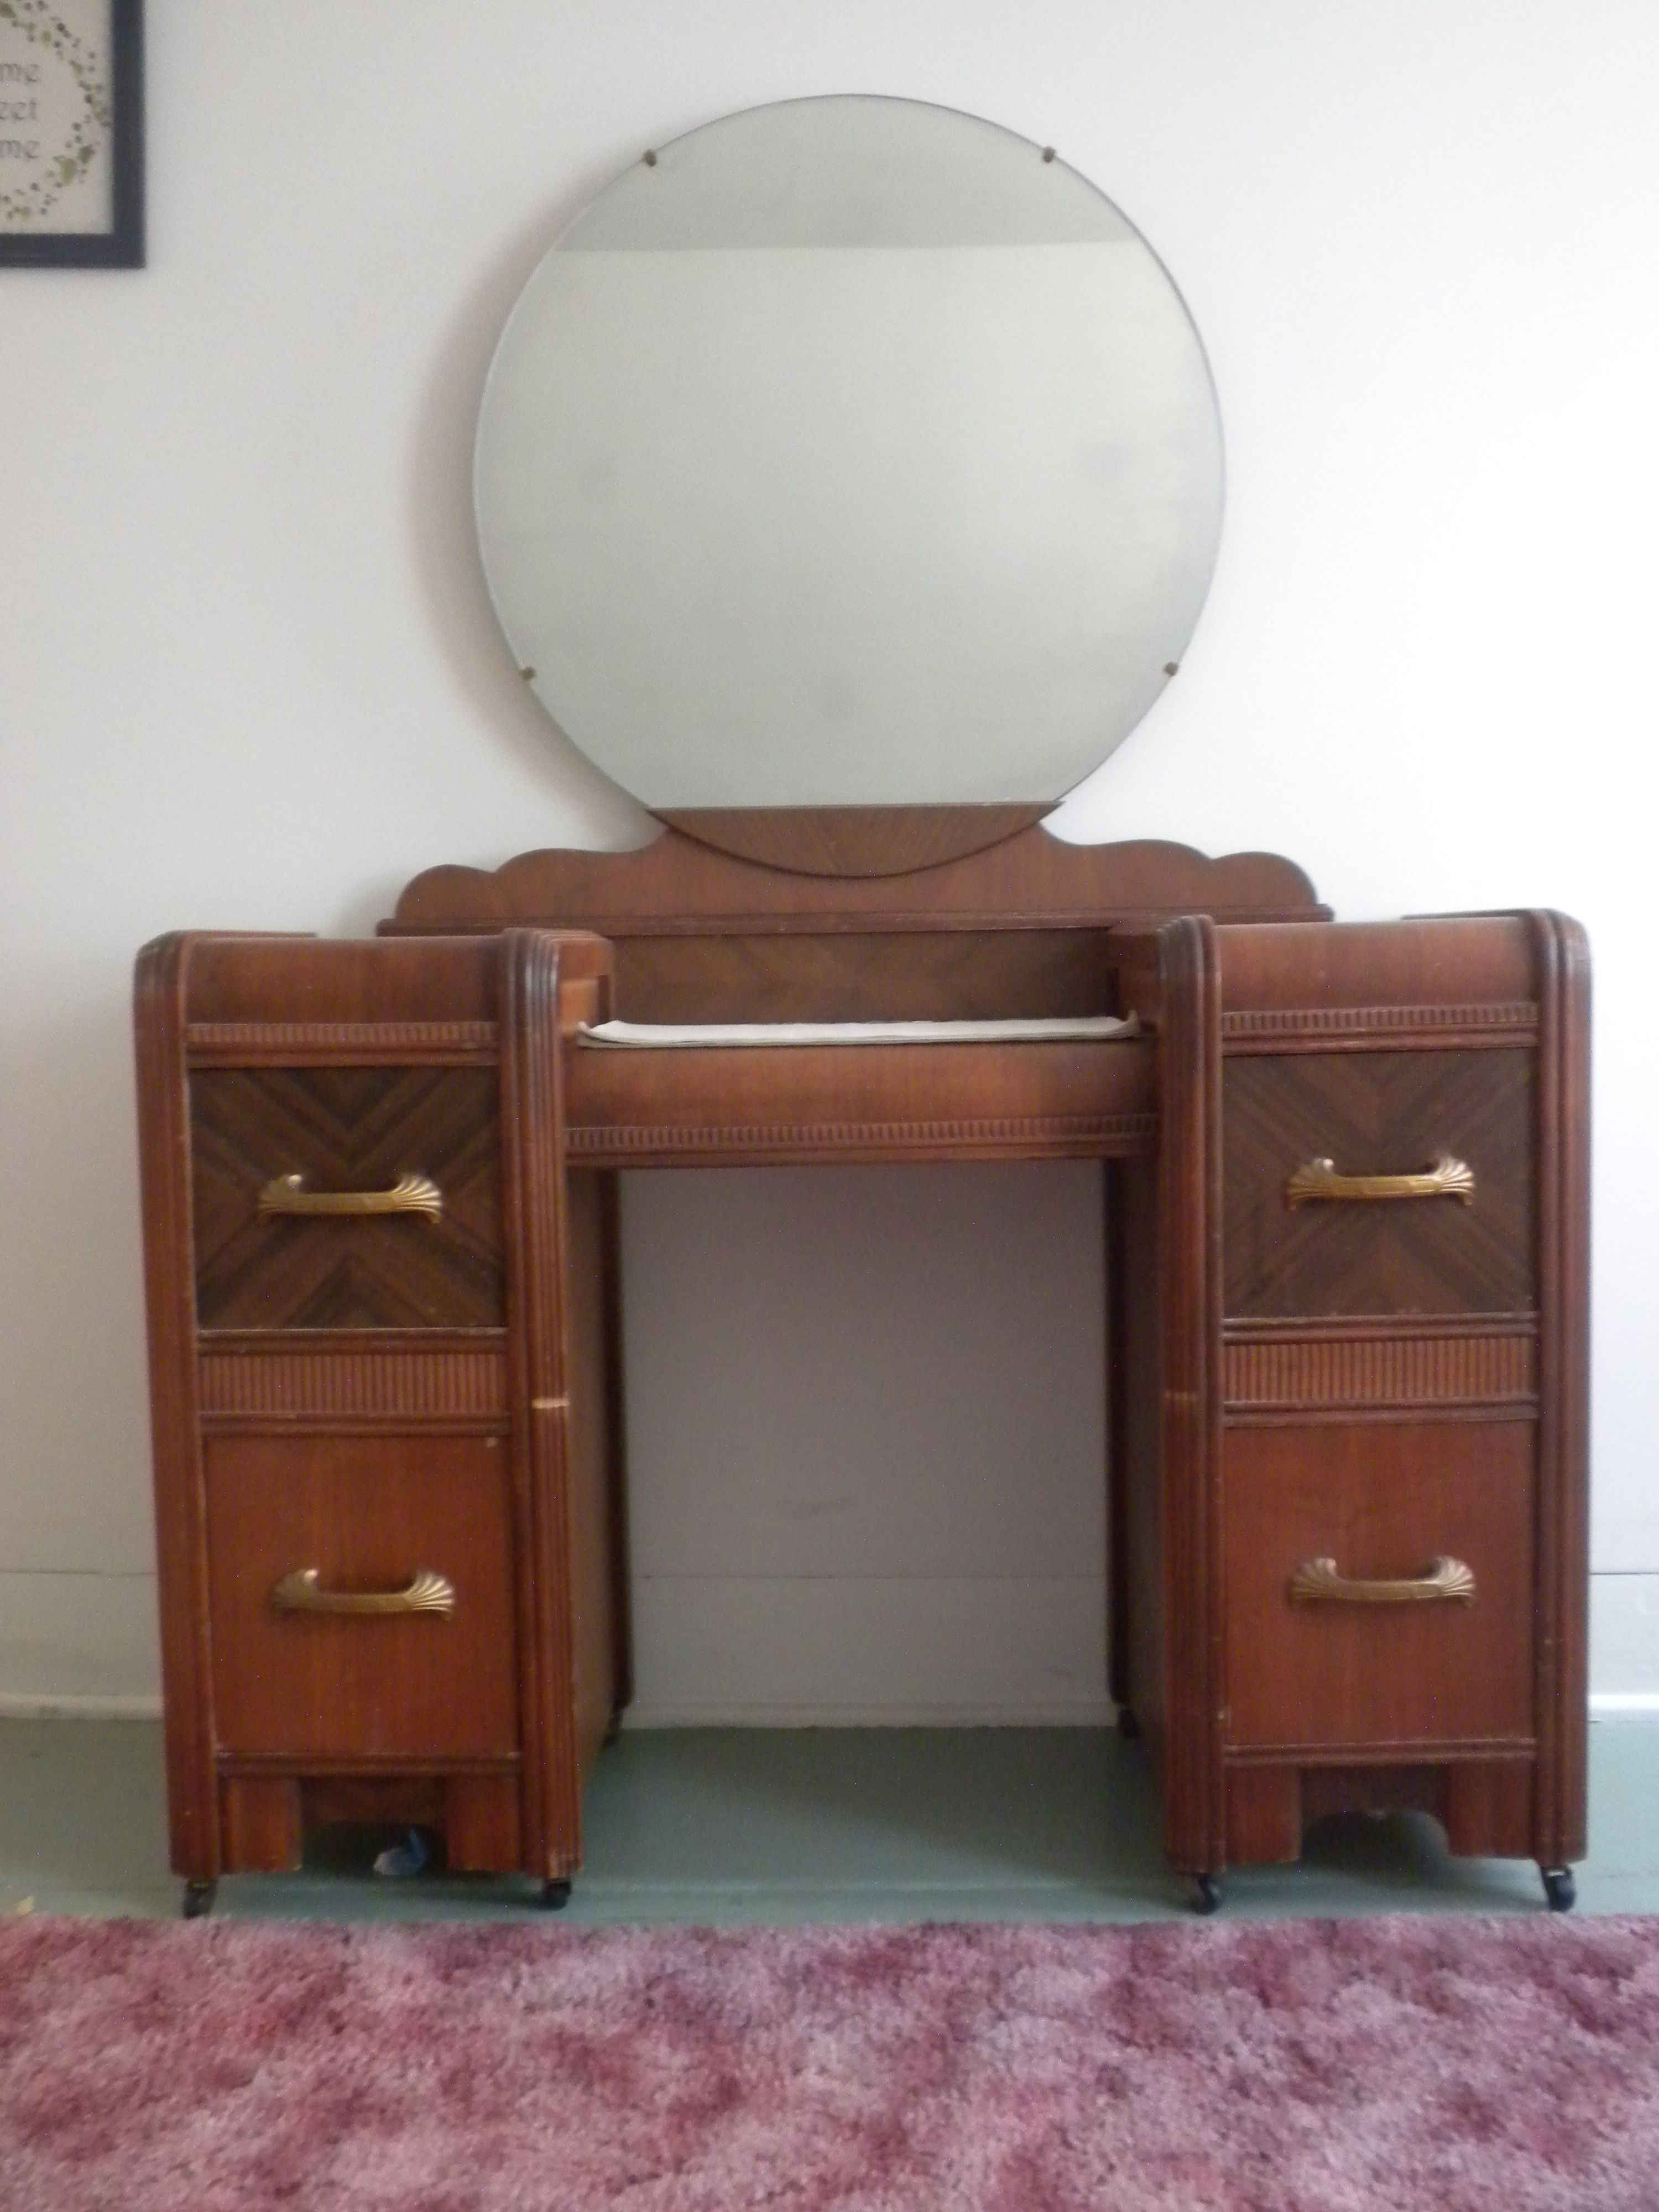 1930s Bedroom Furniture Styles